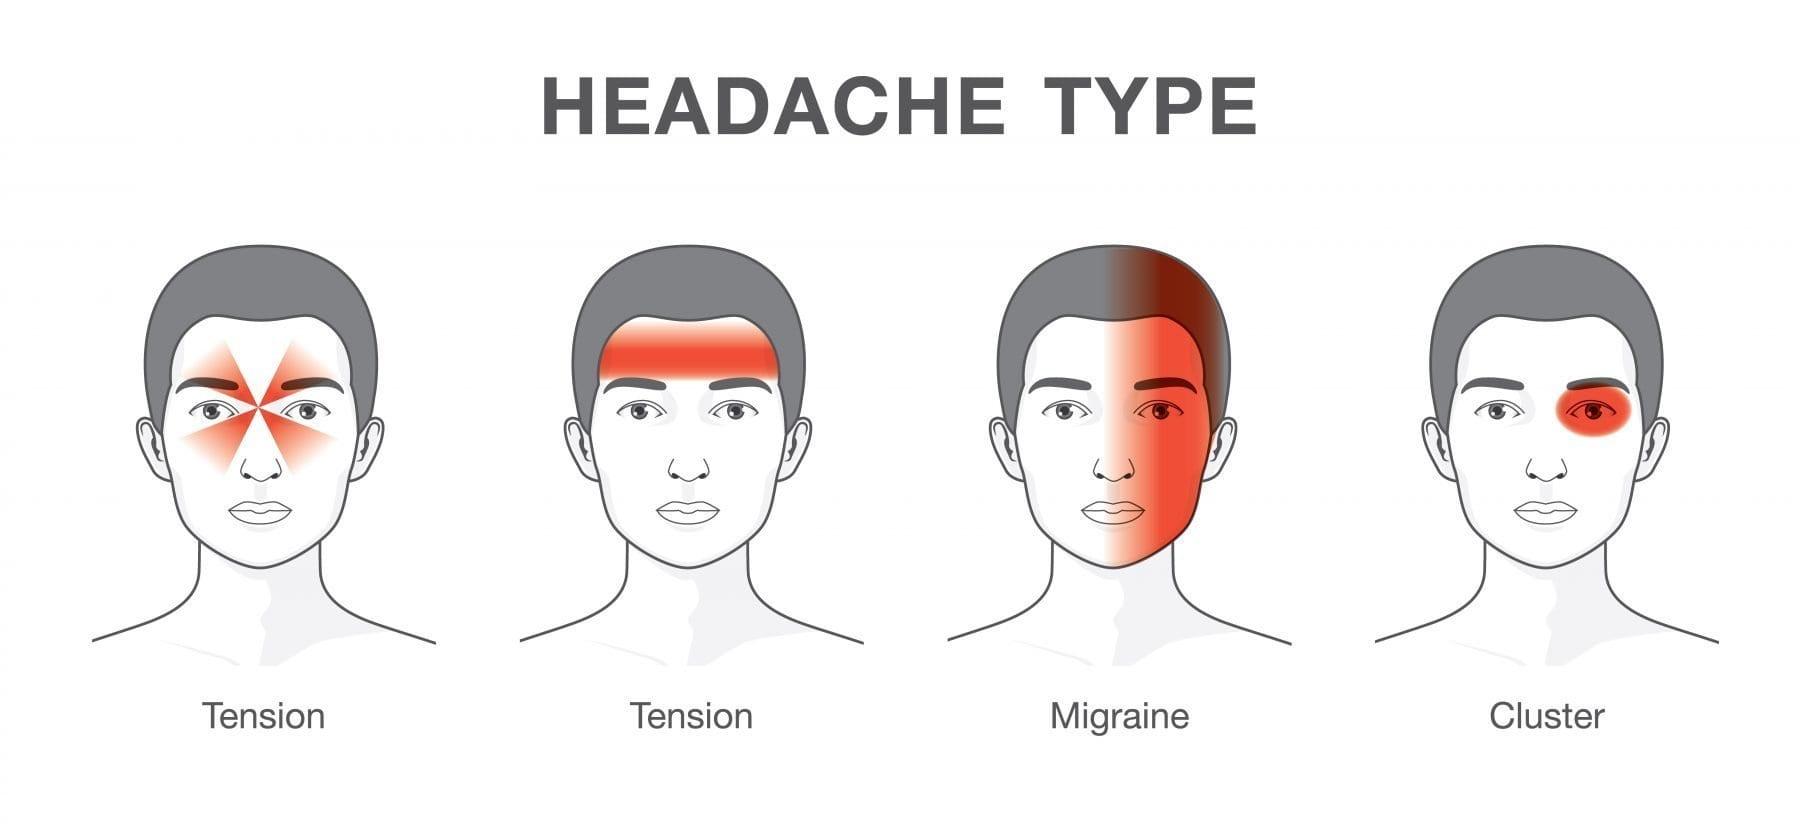 types of headaches illustration